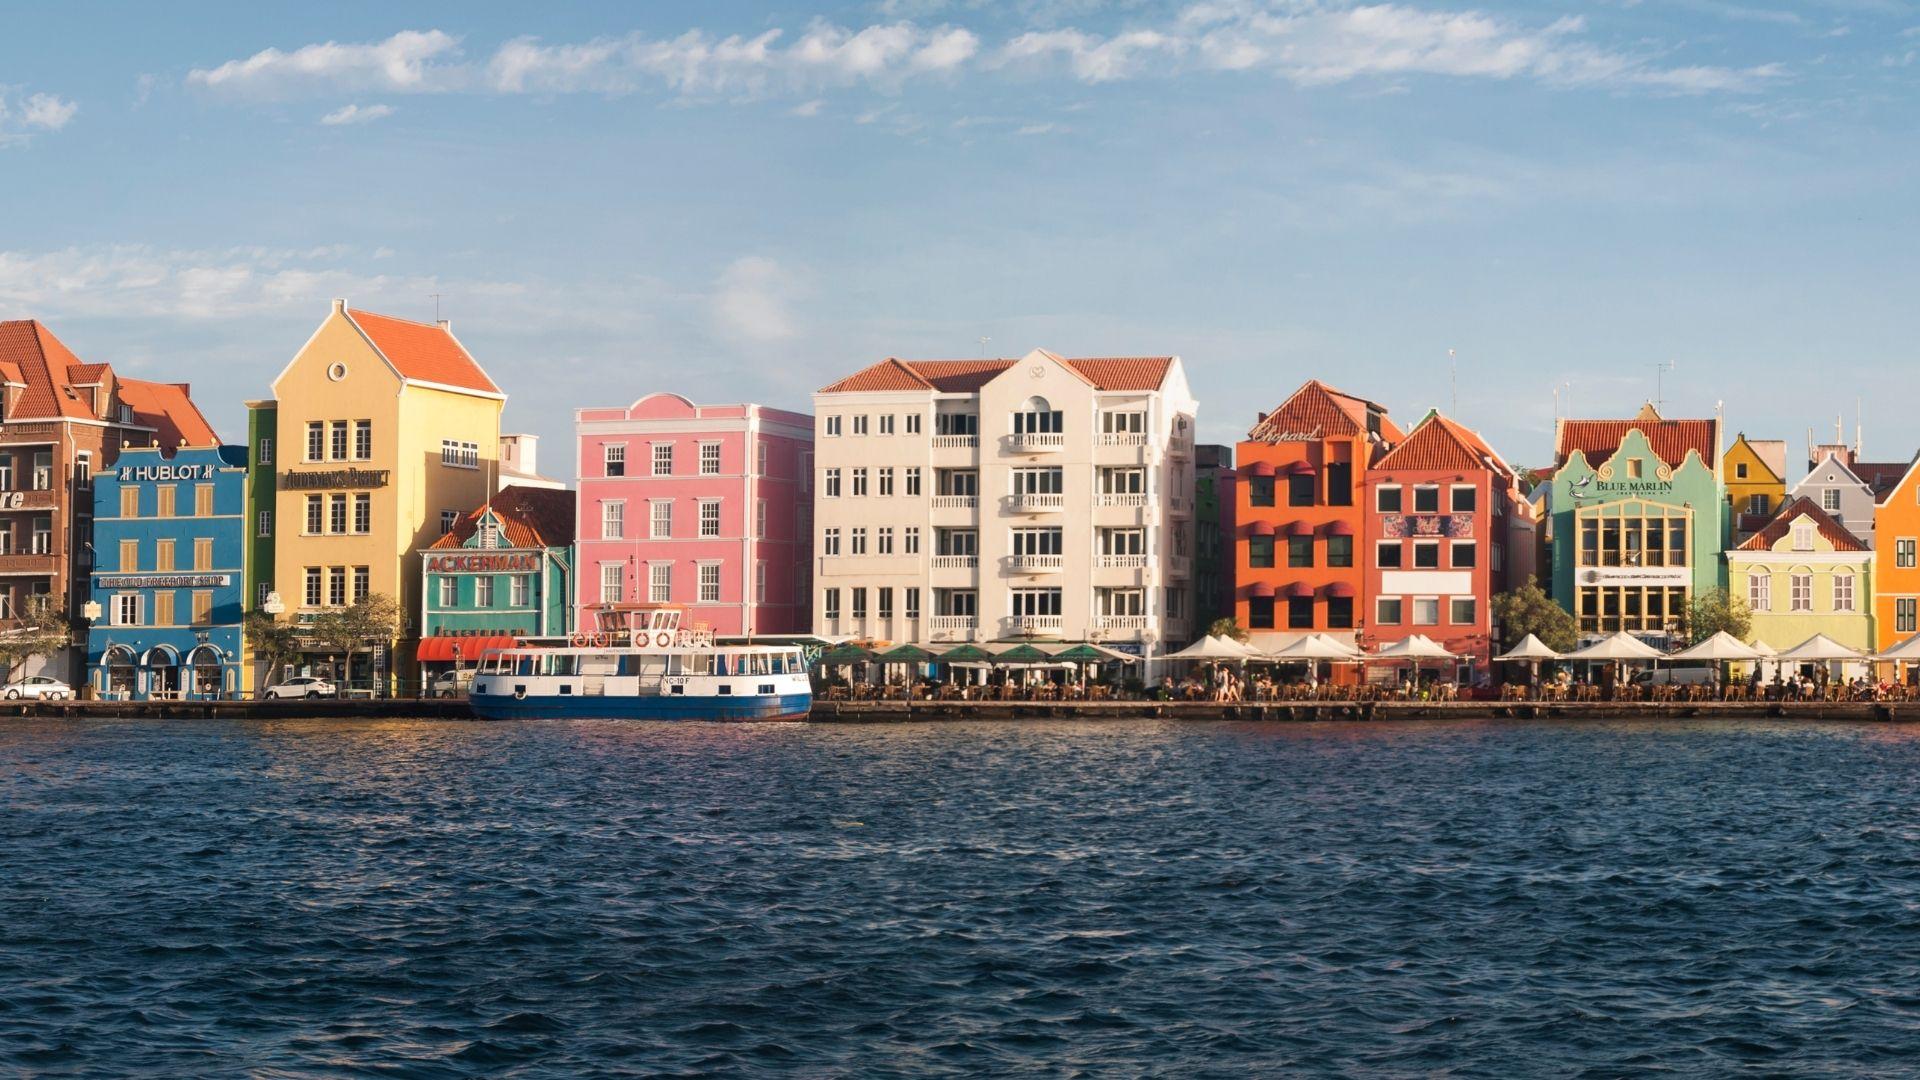 Handelskade Curacao island